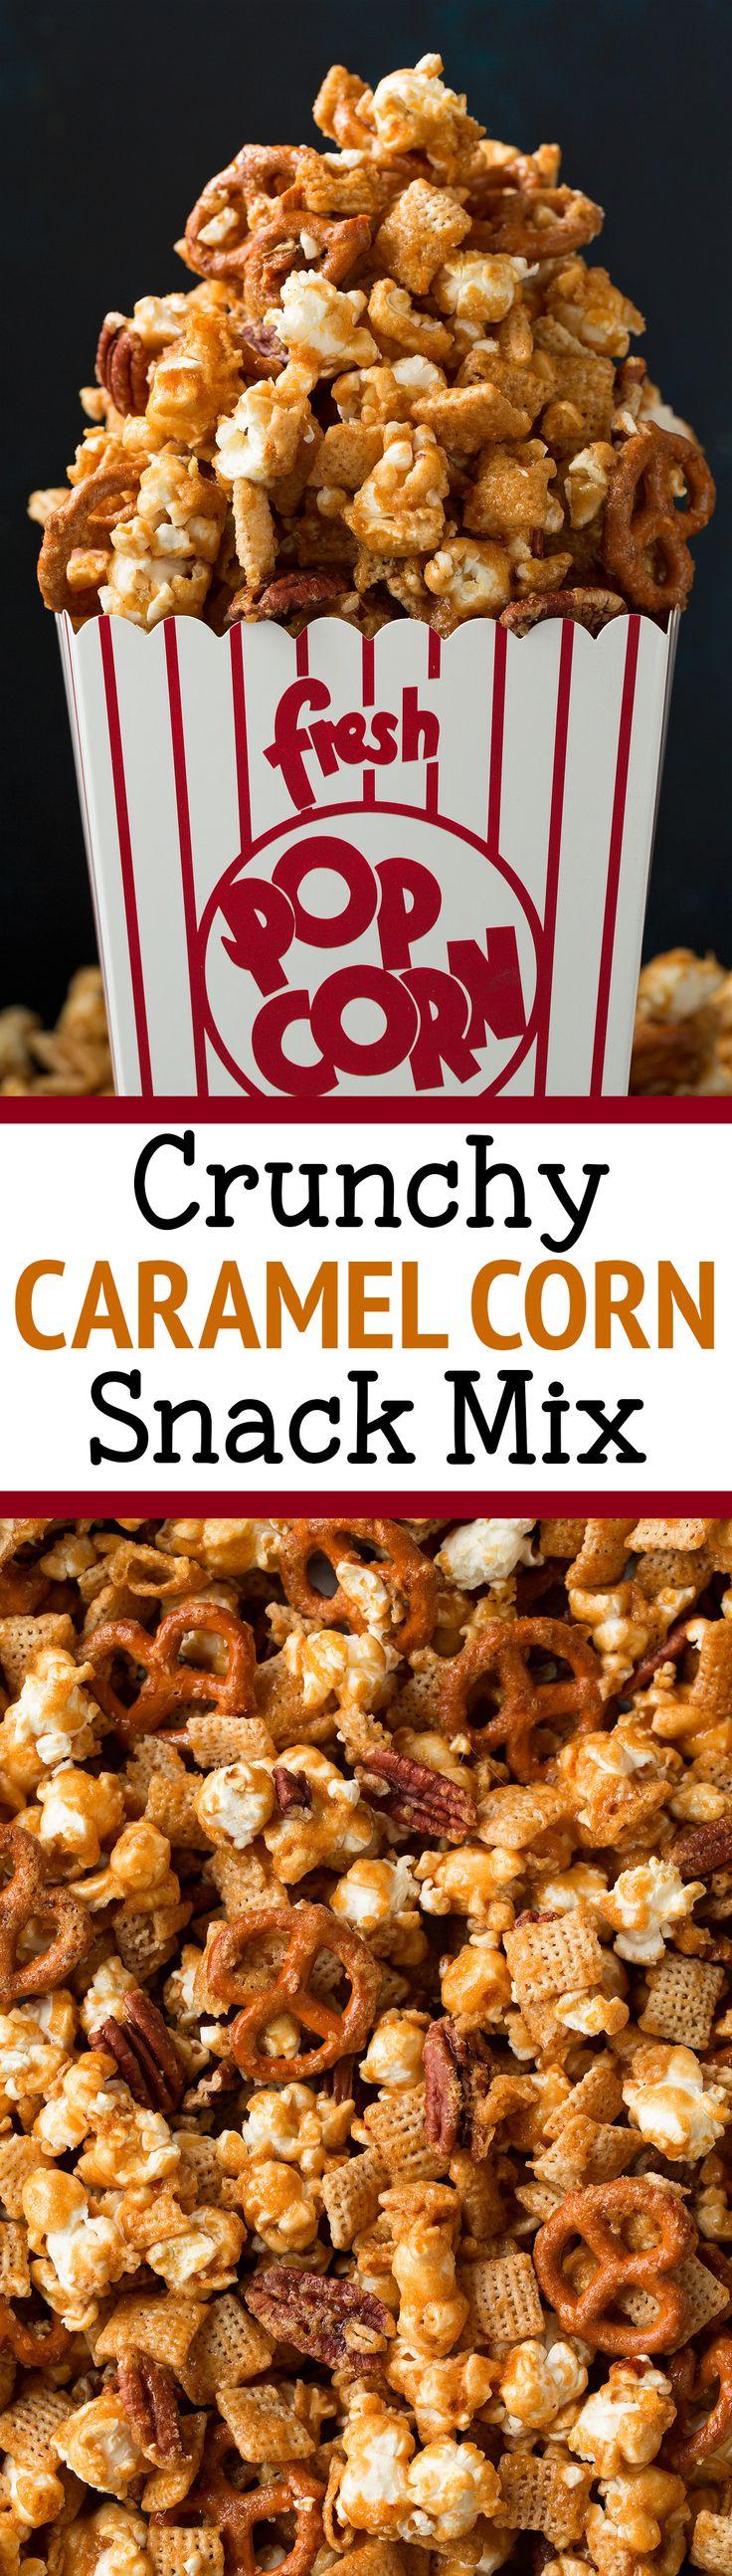 Crunchy Caramel Corn Snack Mix - Cooking Classy